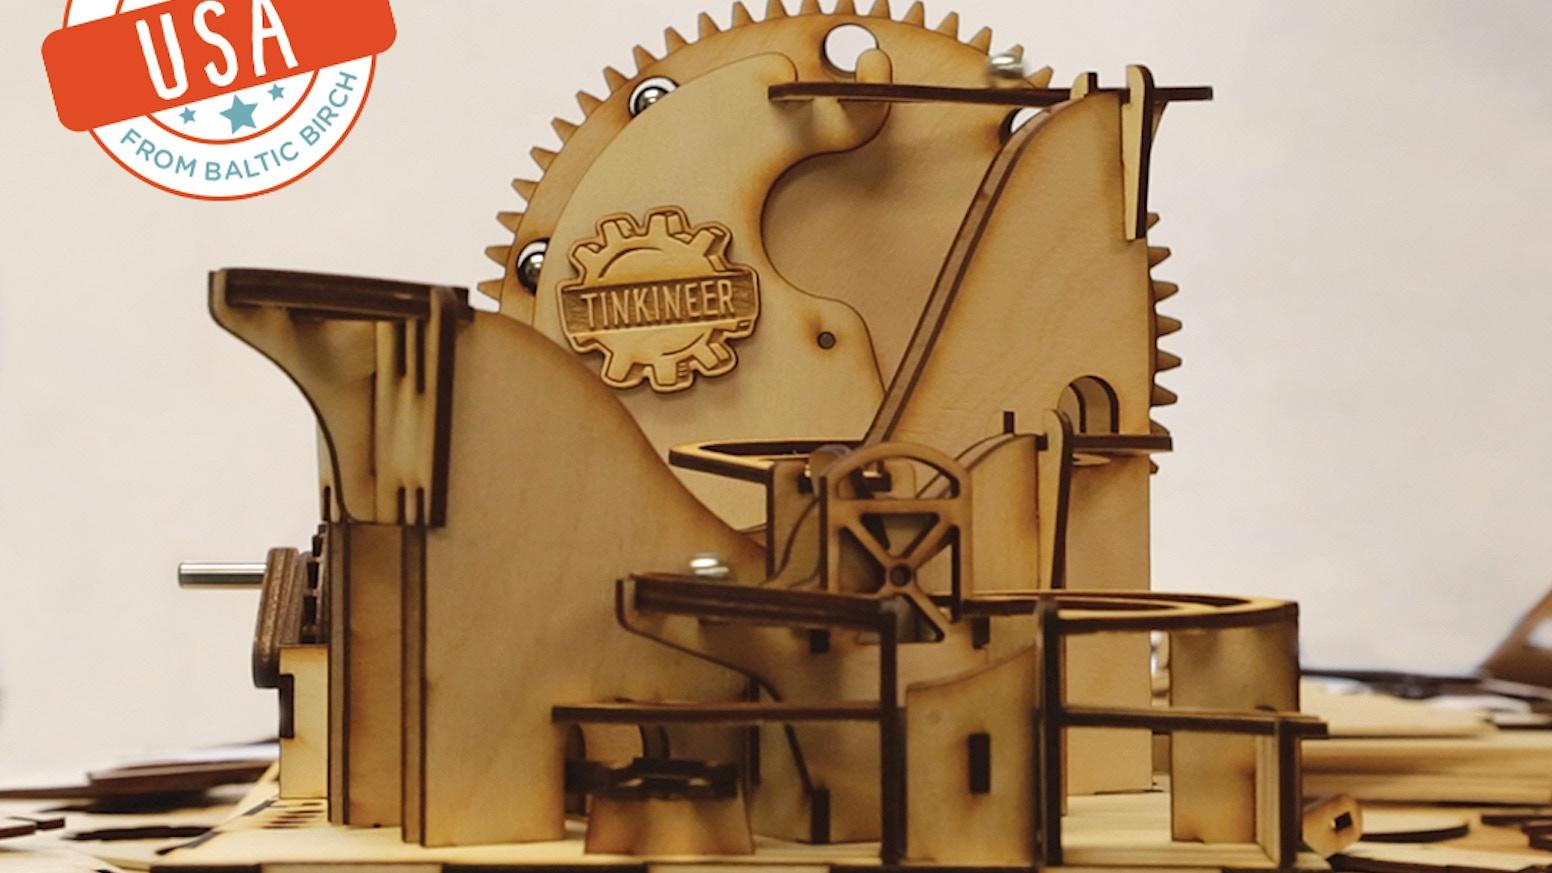 Marbleocity Marble Machine Kit A Stem Maker Experience